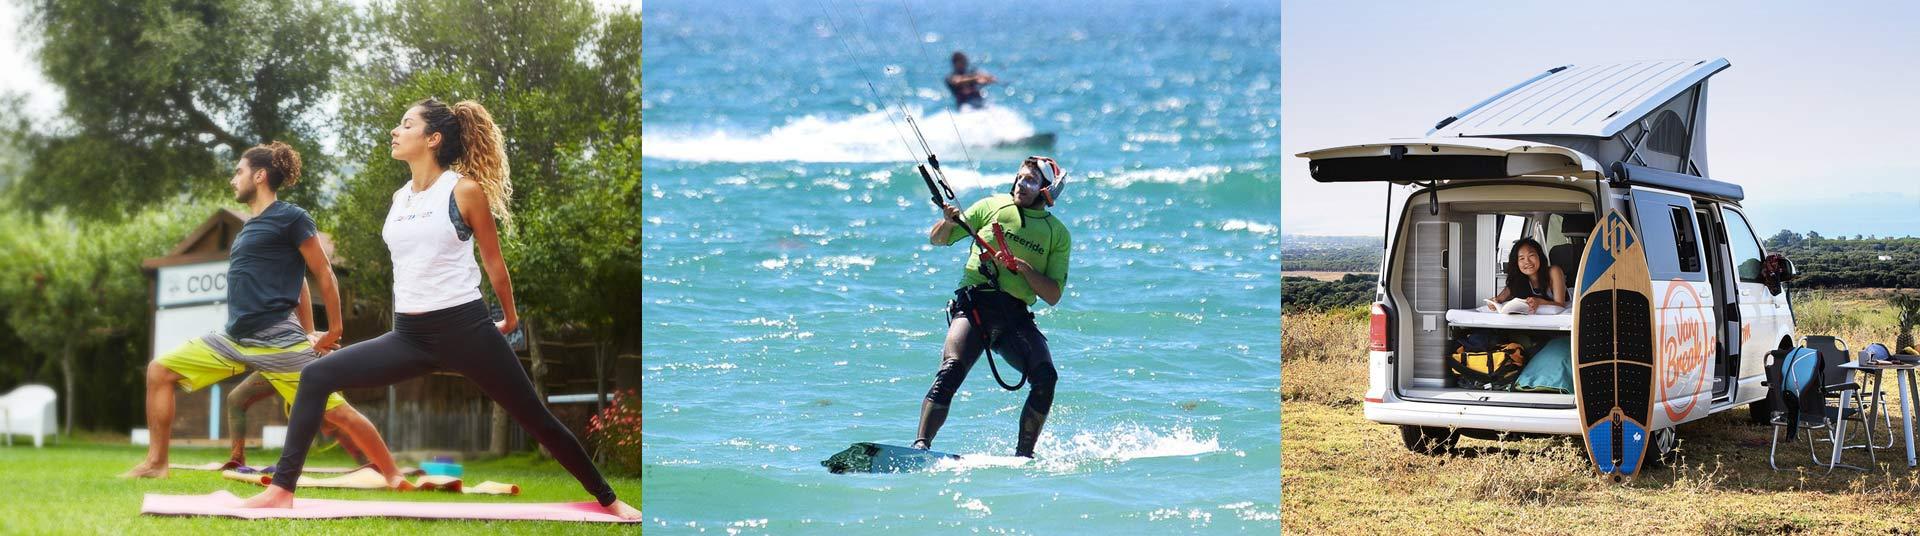 Vacances kitesurf en Europe